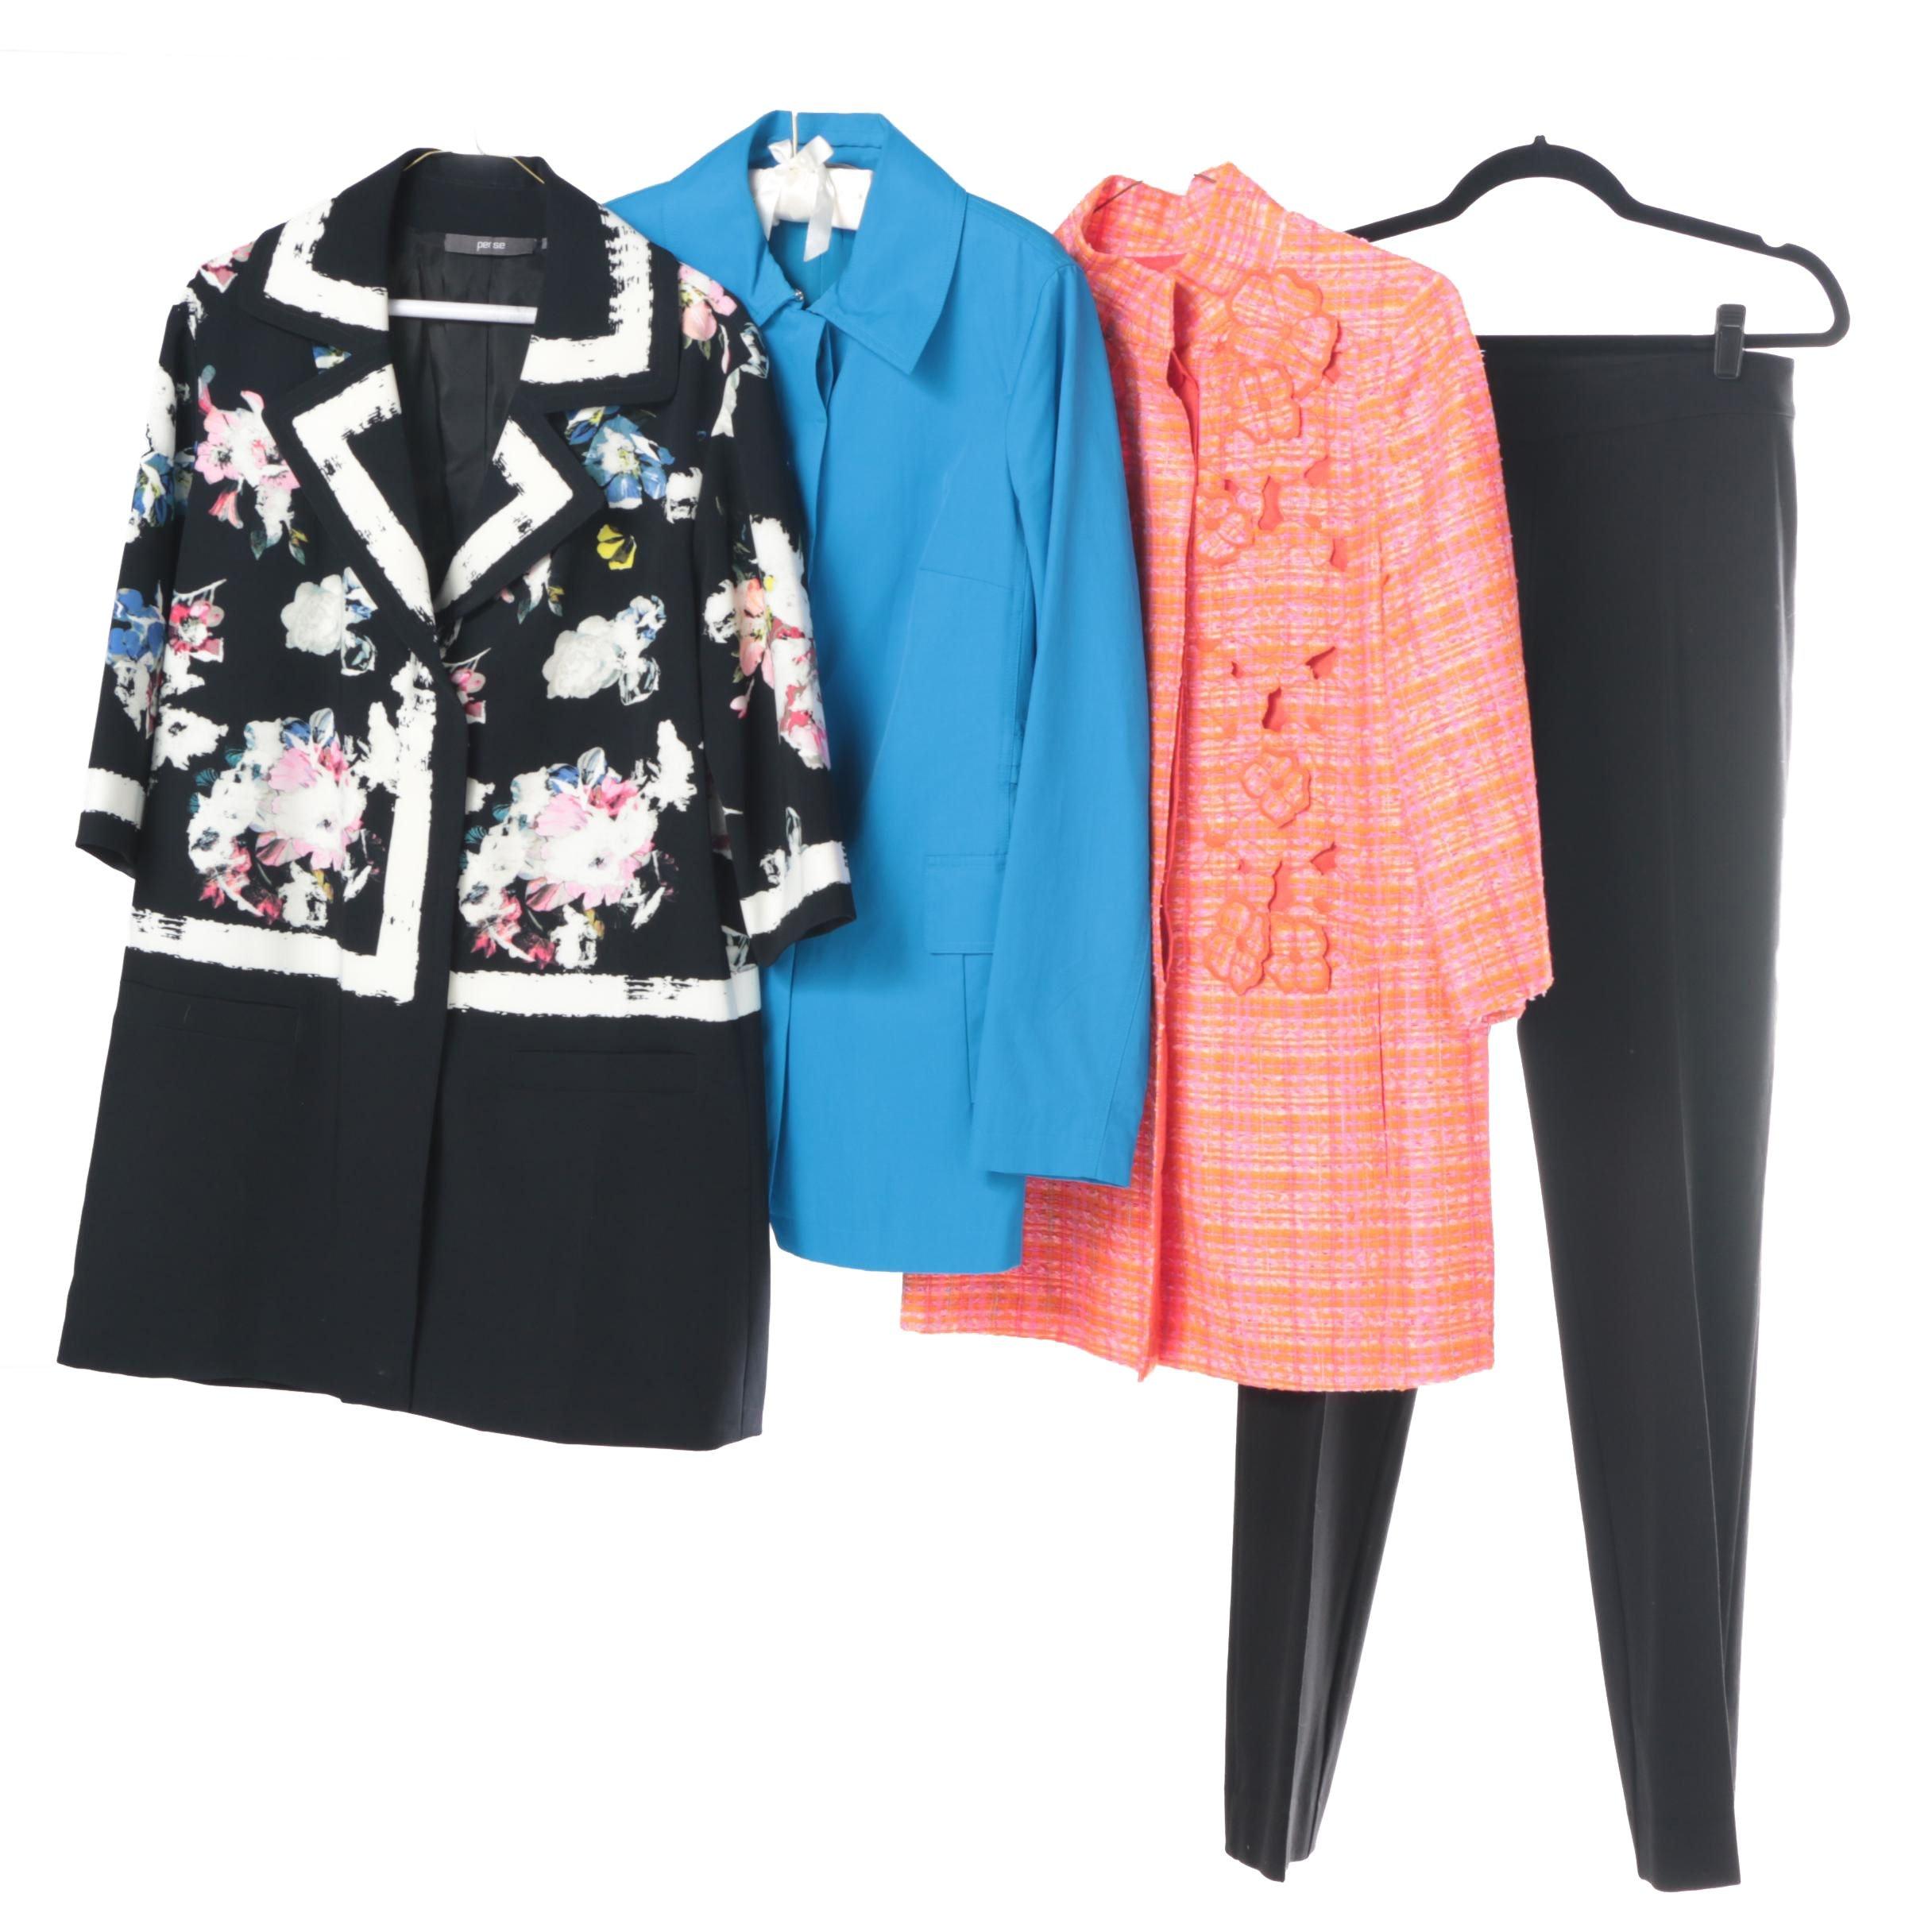 Women's Per Se Dress Coats with Black Dress Pants